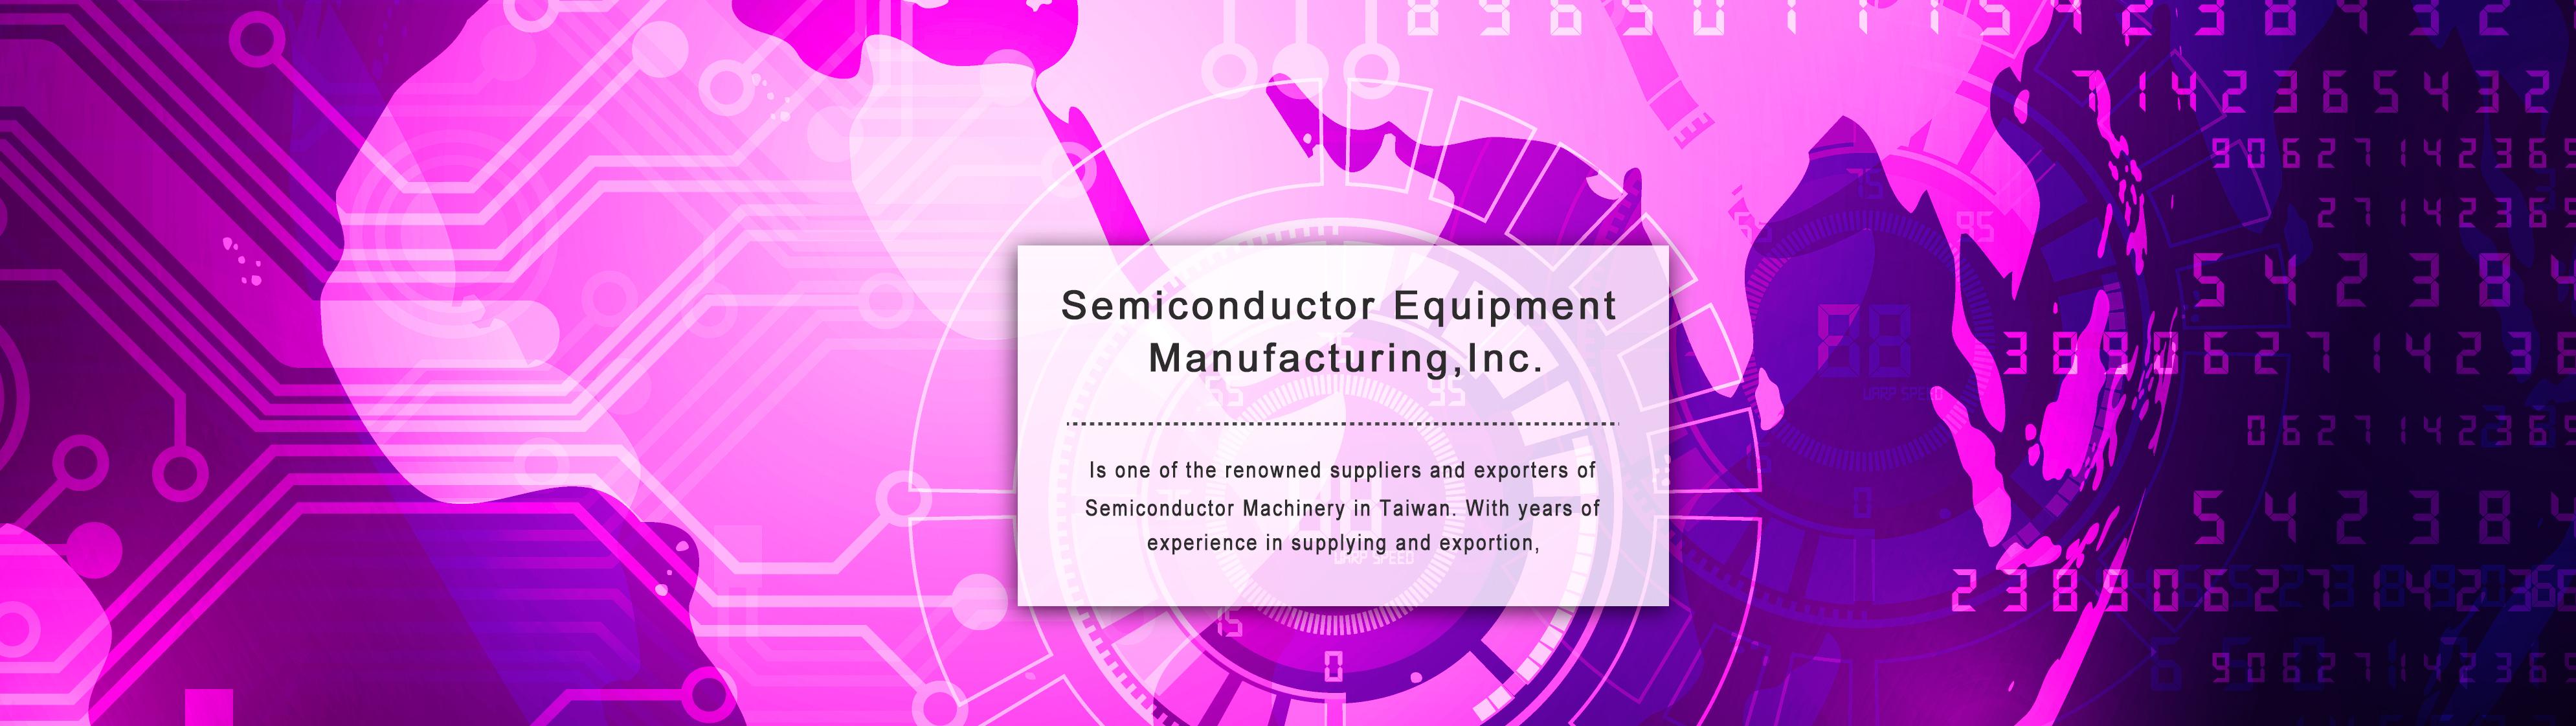 Semiconductor Equipment Manufacturing, Inc